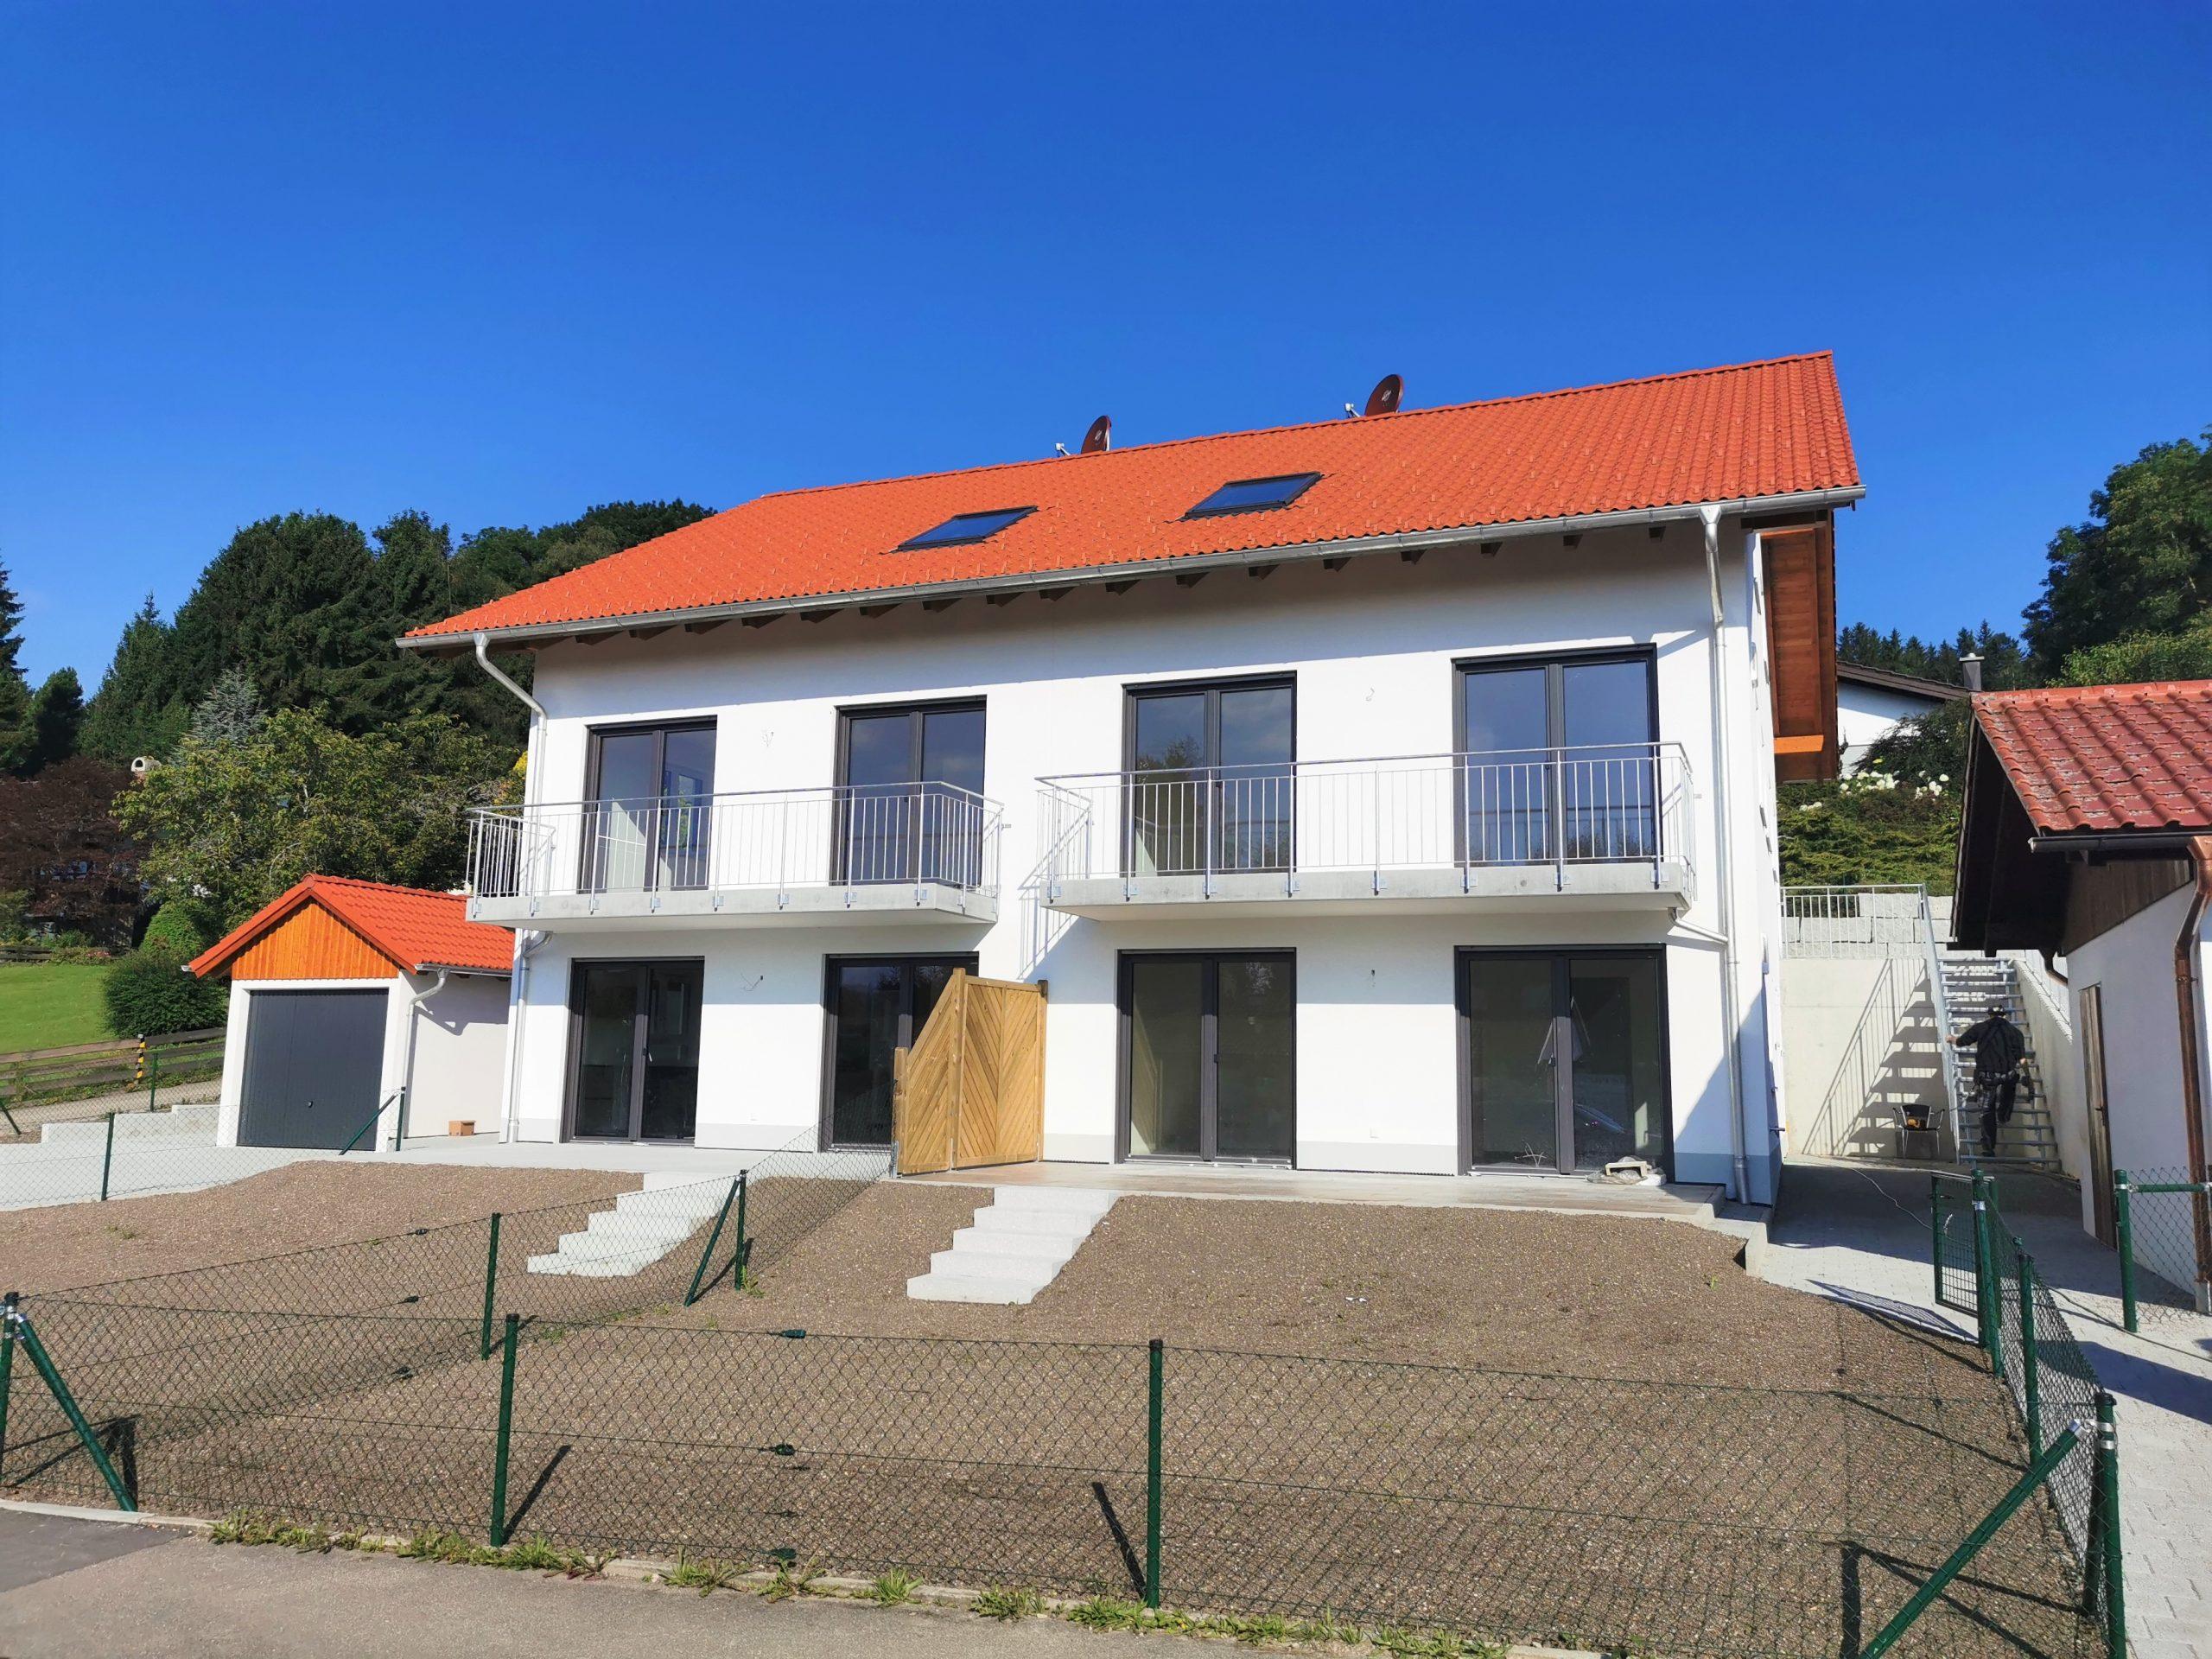 Doppelhaus in Peiting